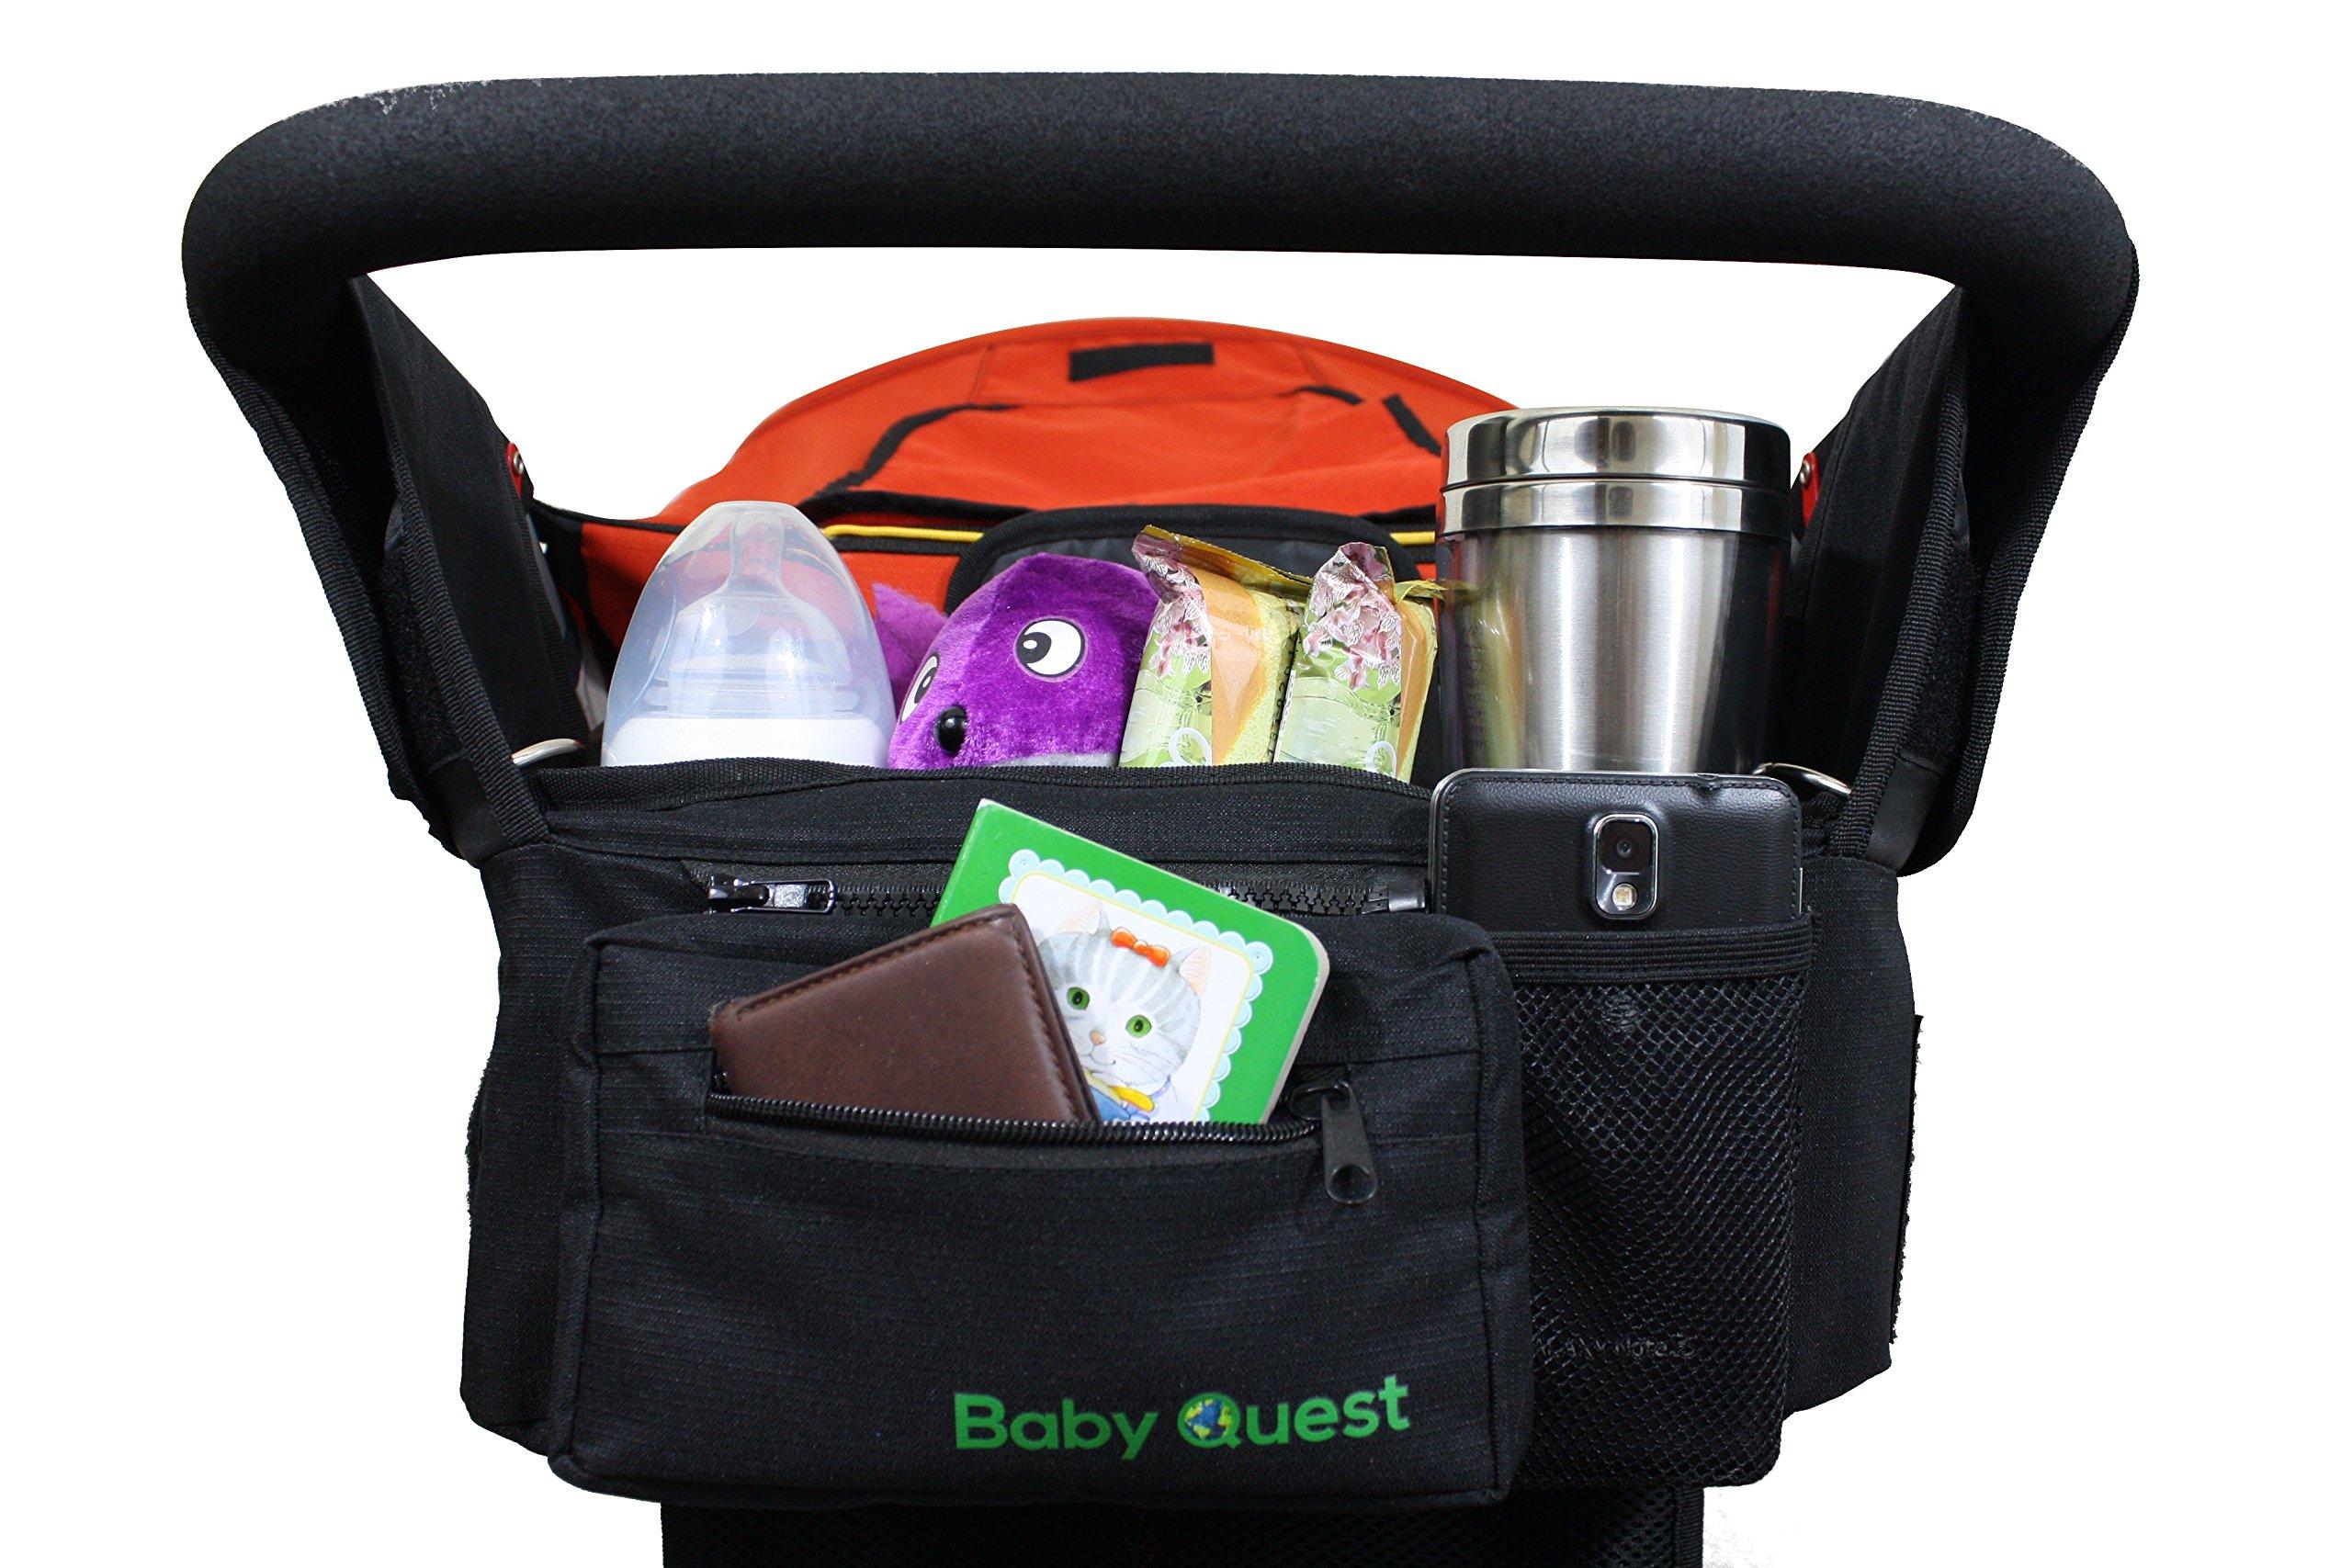 Stroller Organizer - Universal Fit Bag + Bonus Umbrella Holder